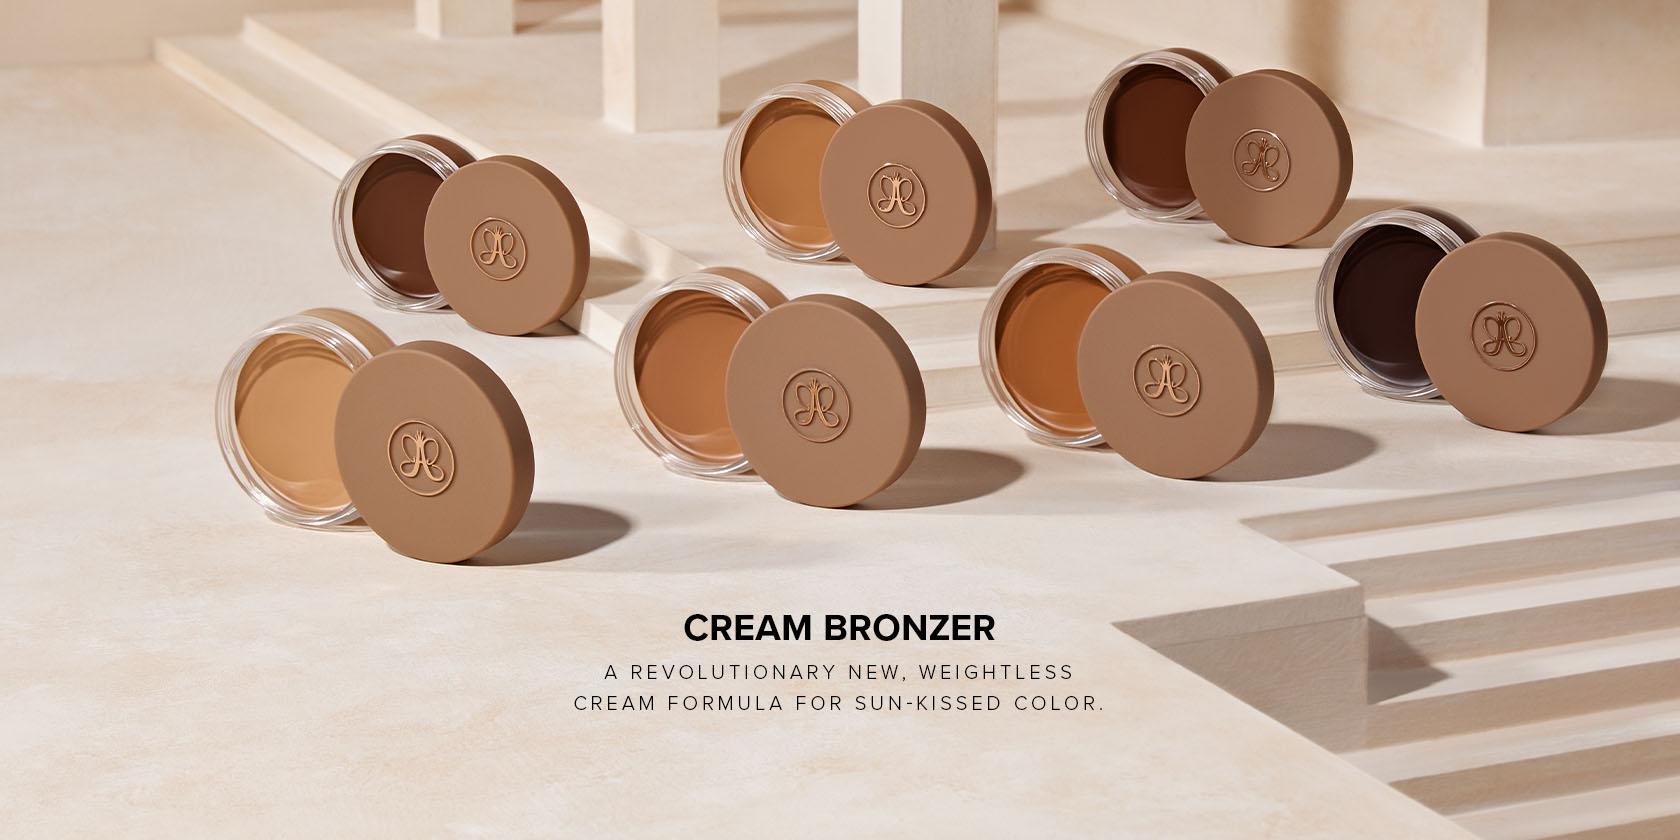 Cream Bronzer a revolutionary new, weightless cream formula for sun kissed color